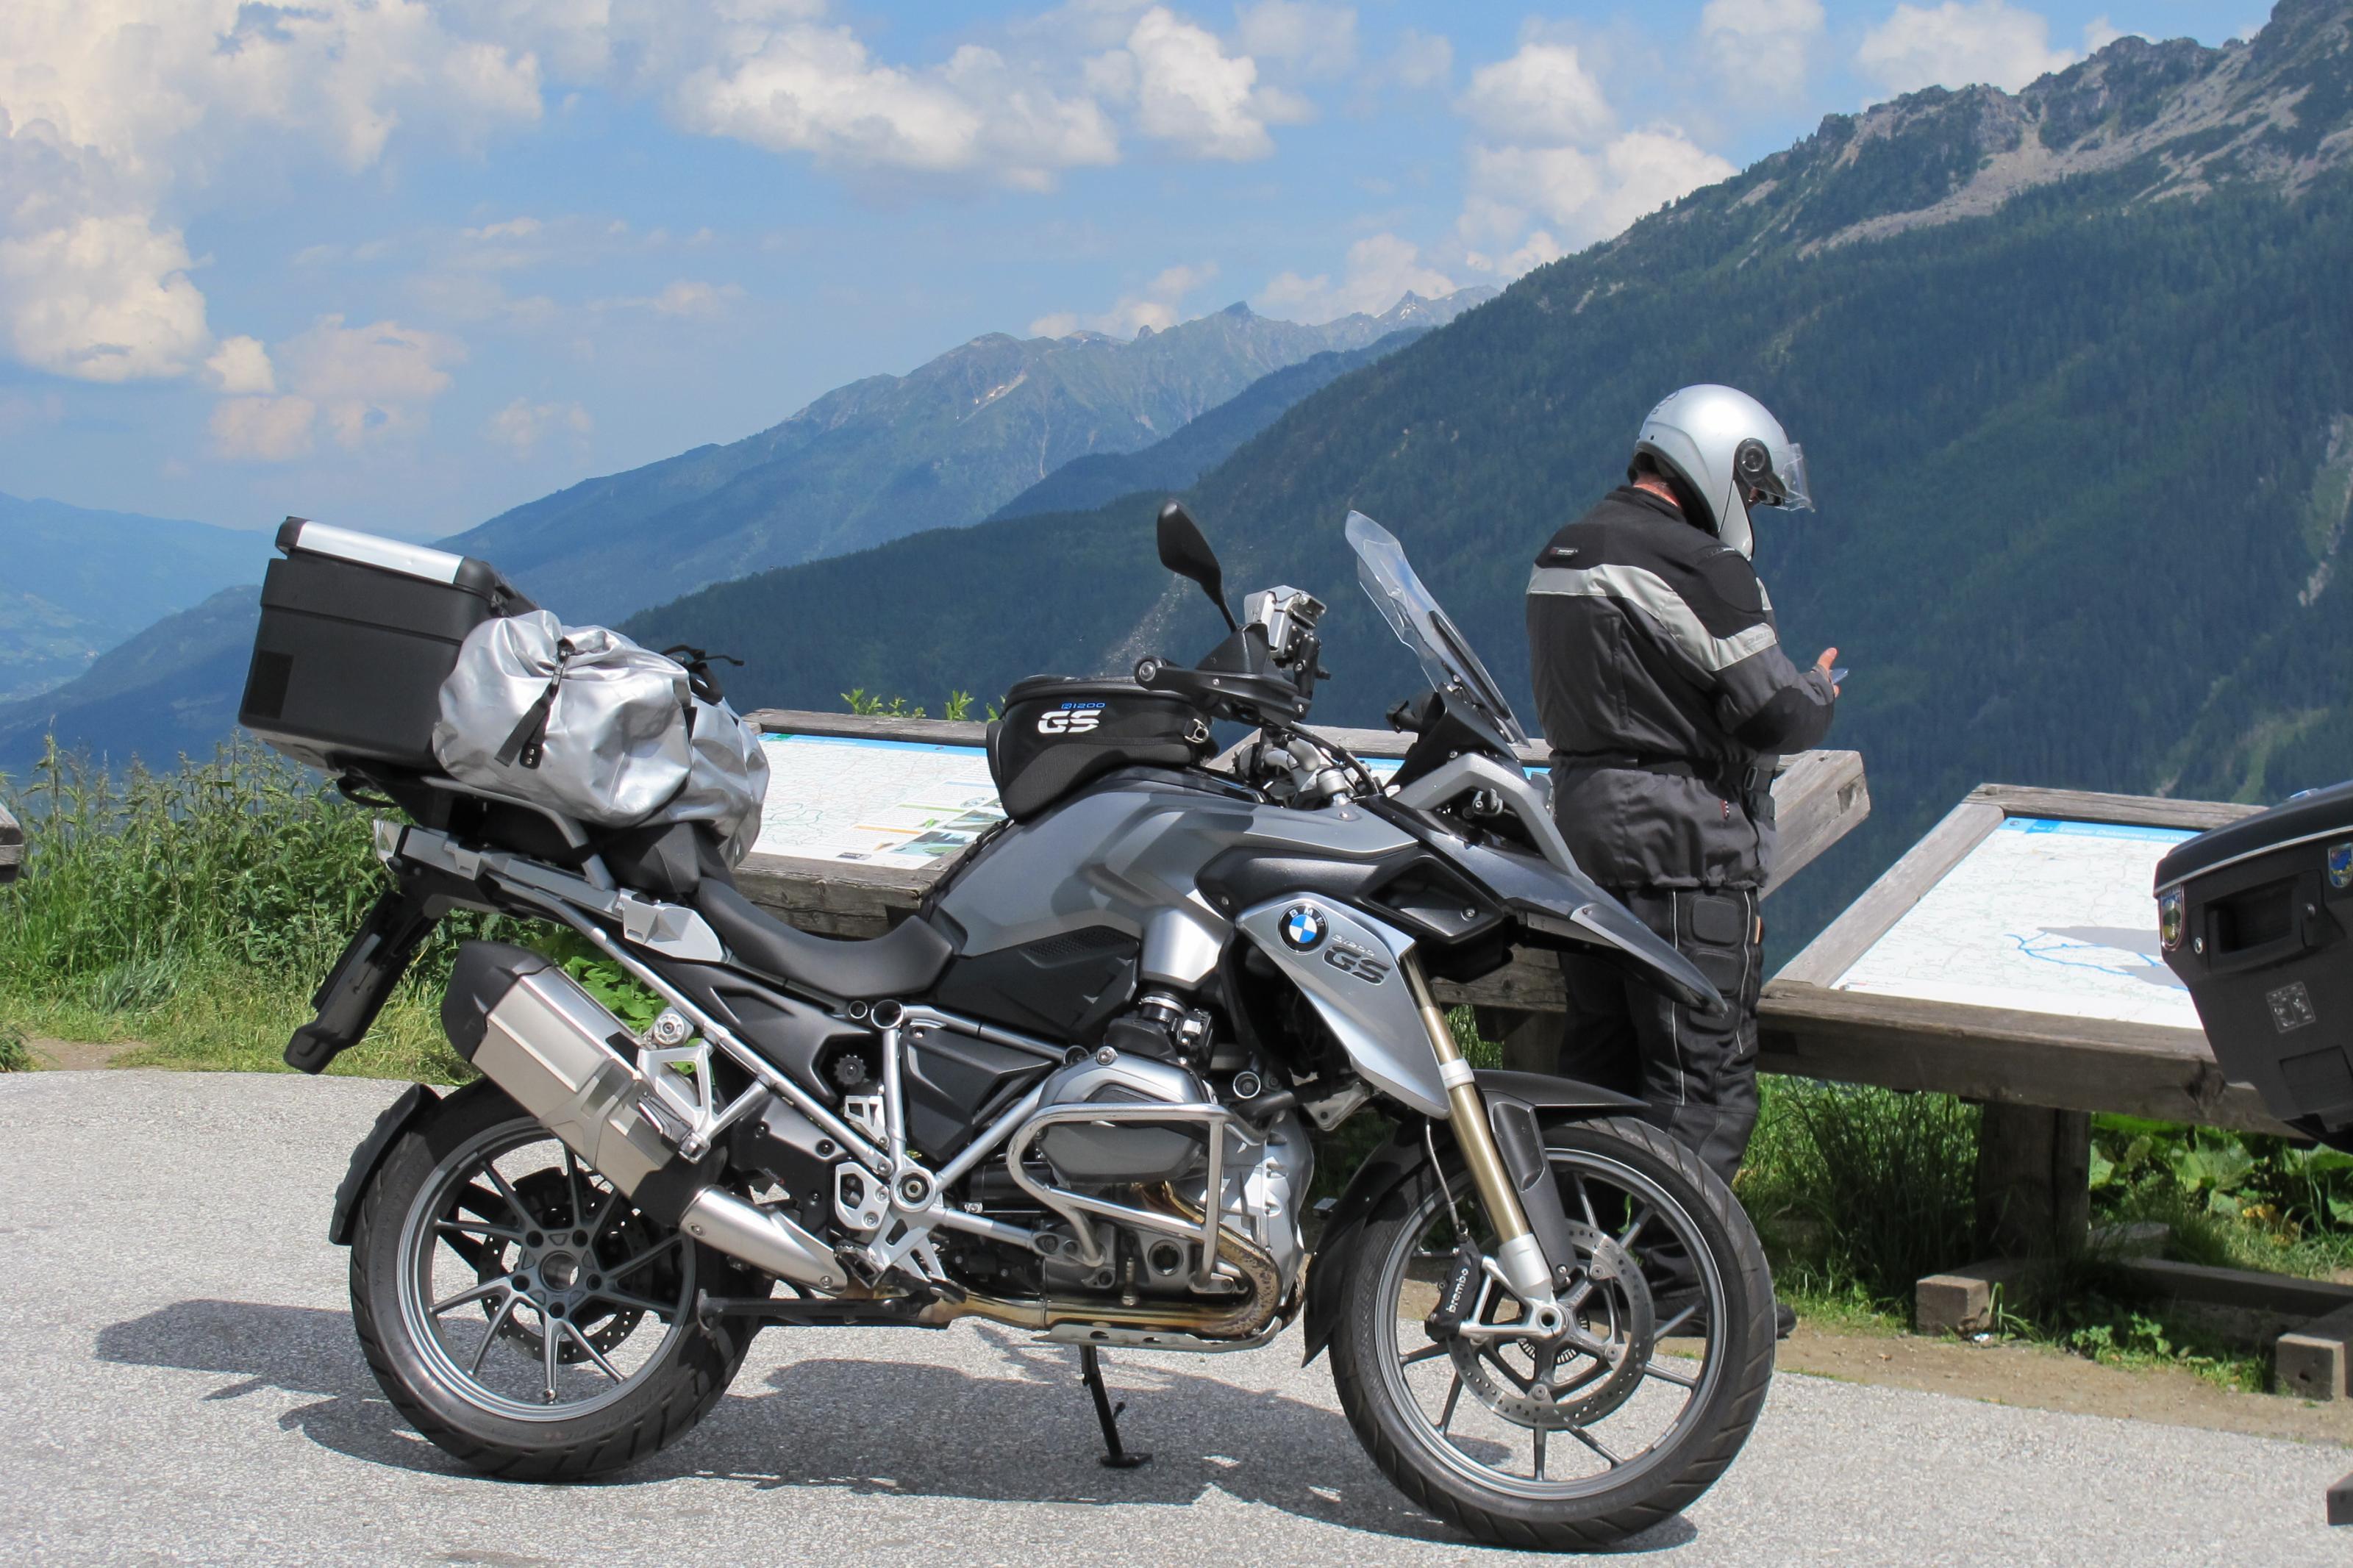 motorradtour-juni-2014-008.jpg